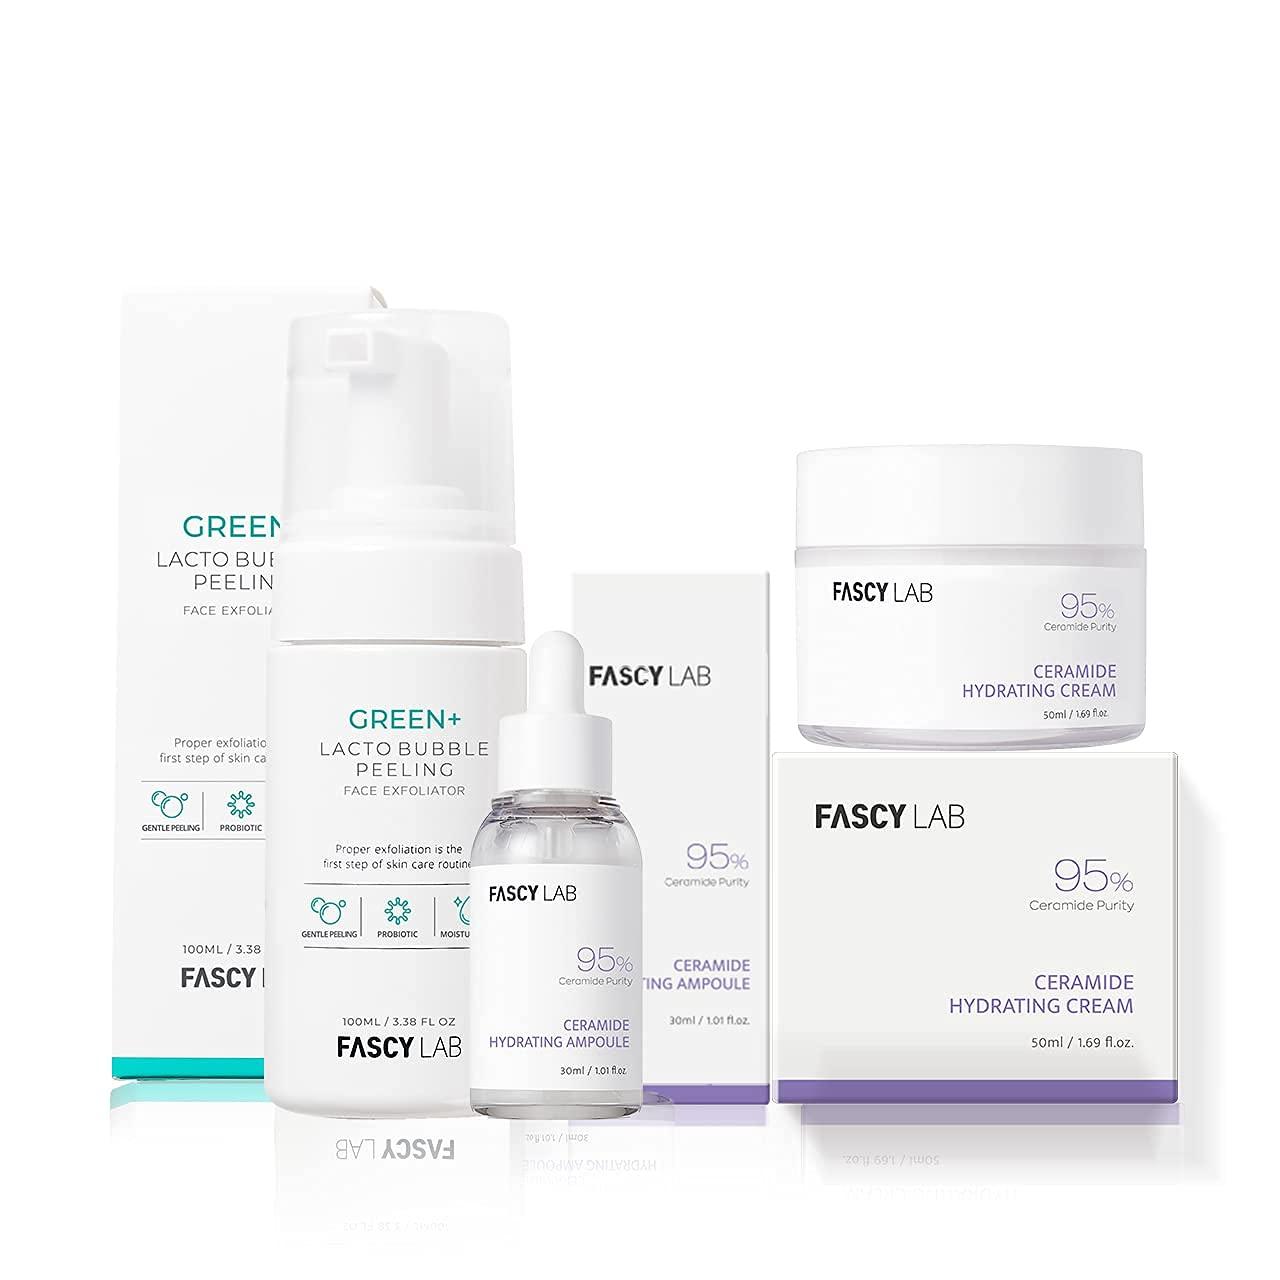 Fascy Lab Korean Skin Super-cheap Care Time sale Treatment S Set — Ceramide Hydrating